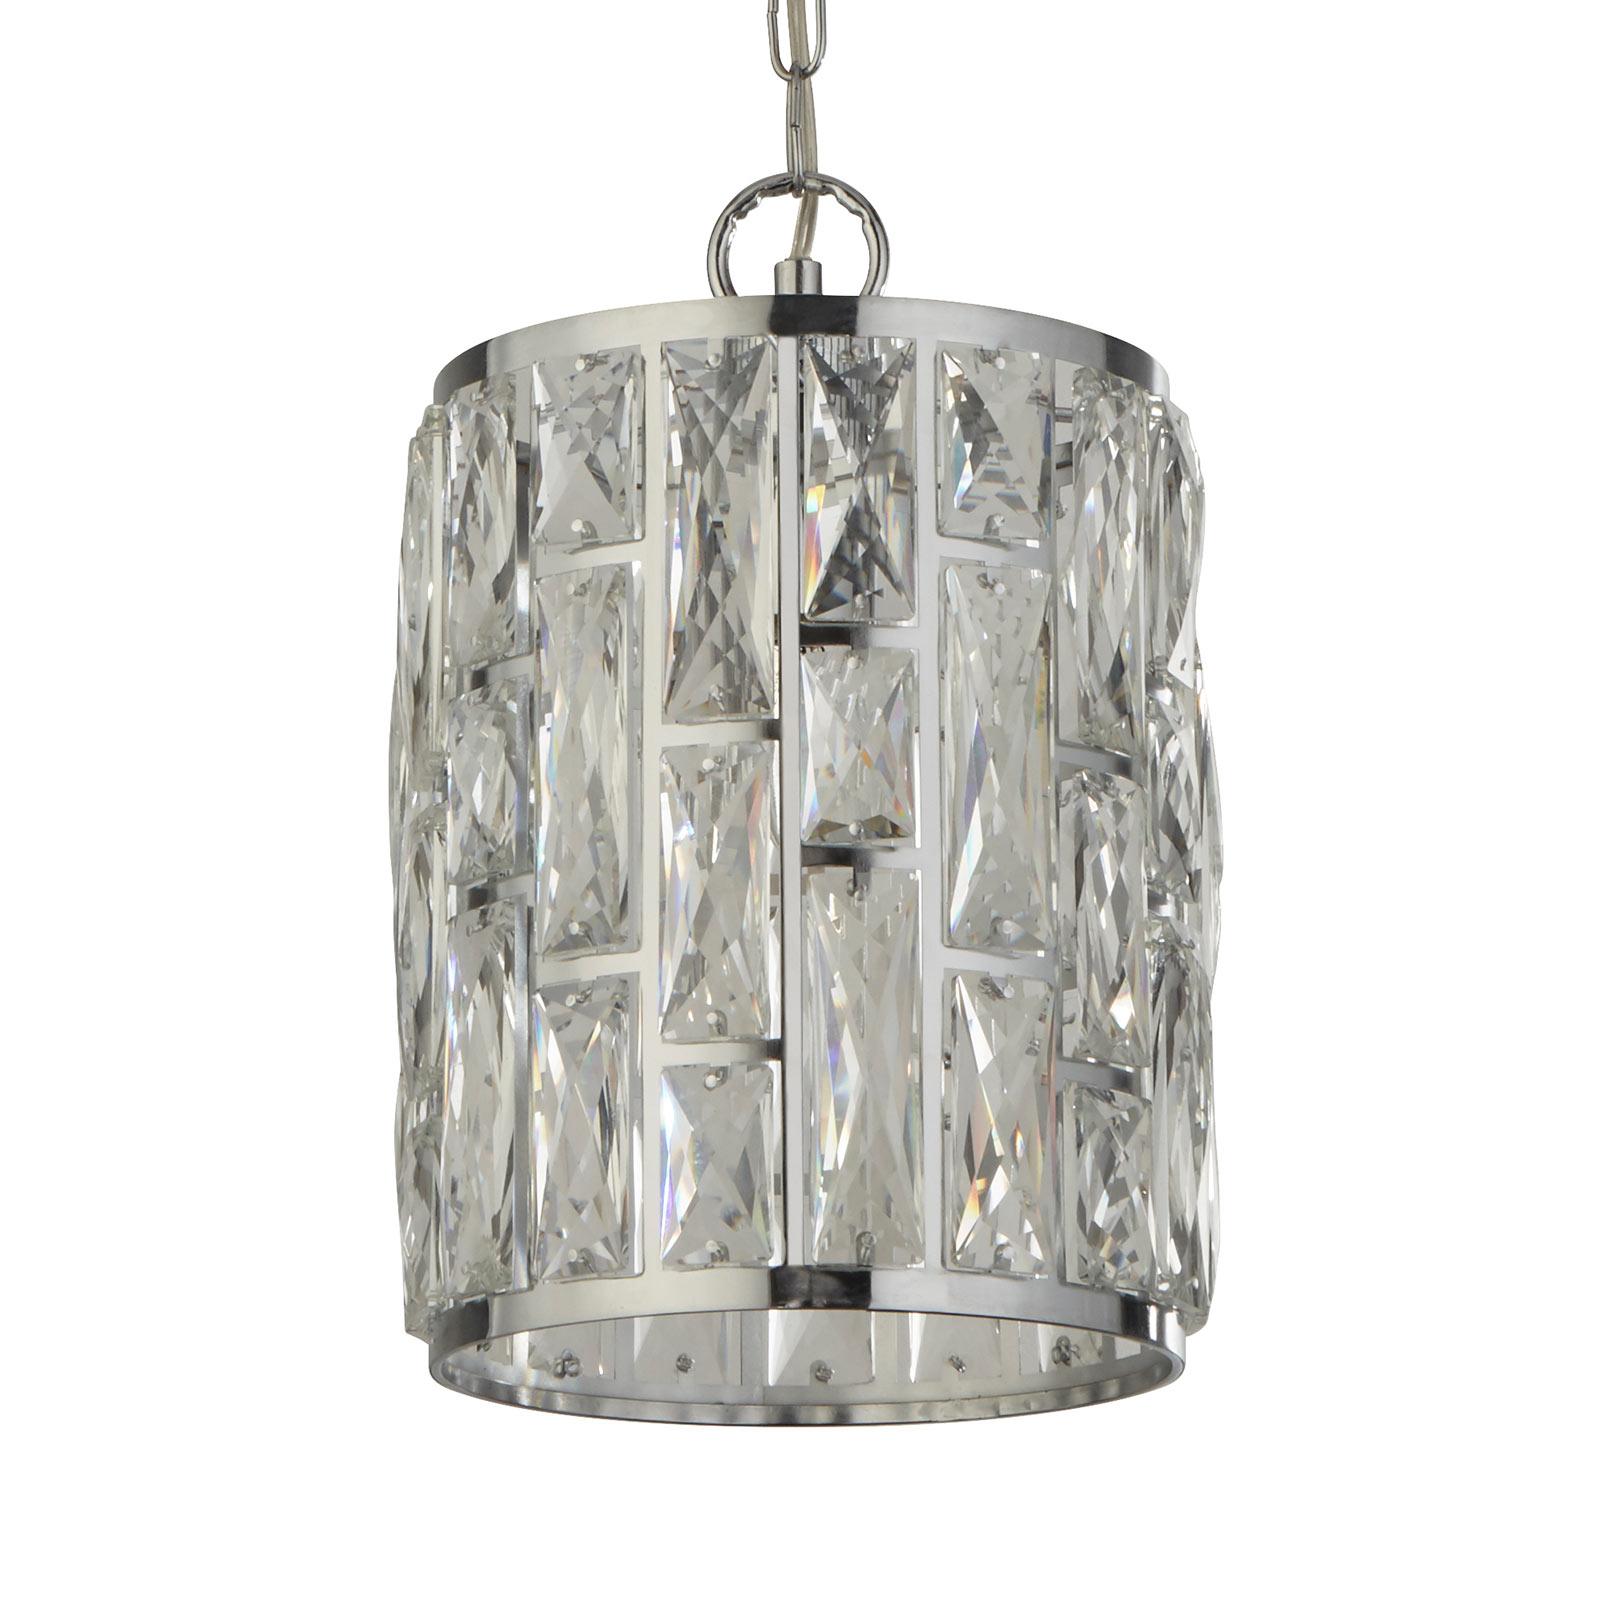 Riippuvalo Bijou, varjostimessa kristalleja, 22 cm